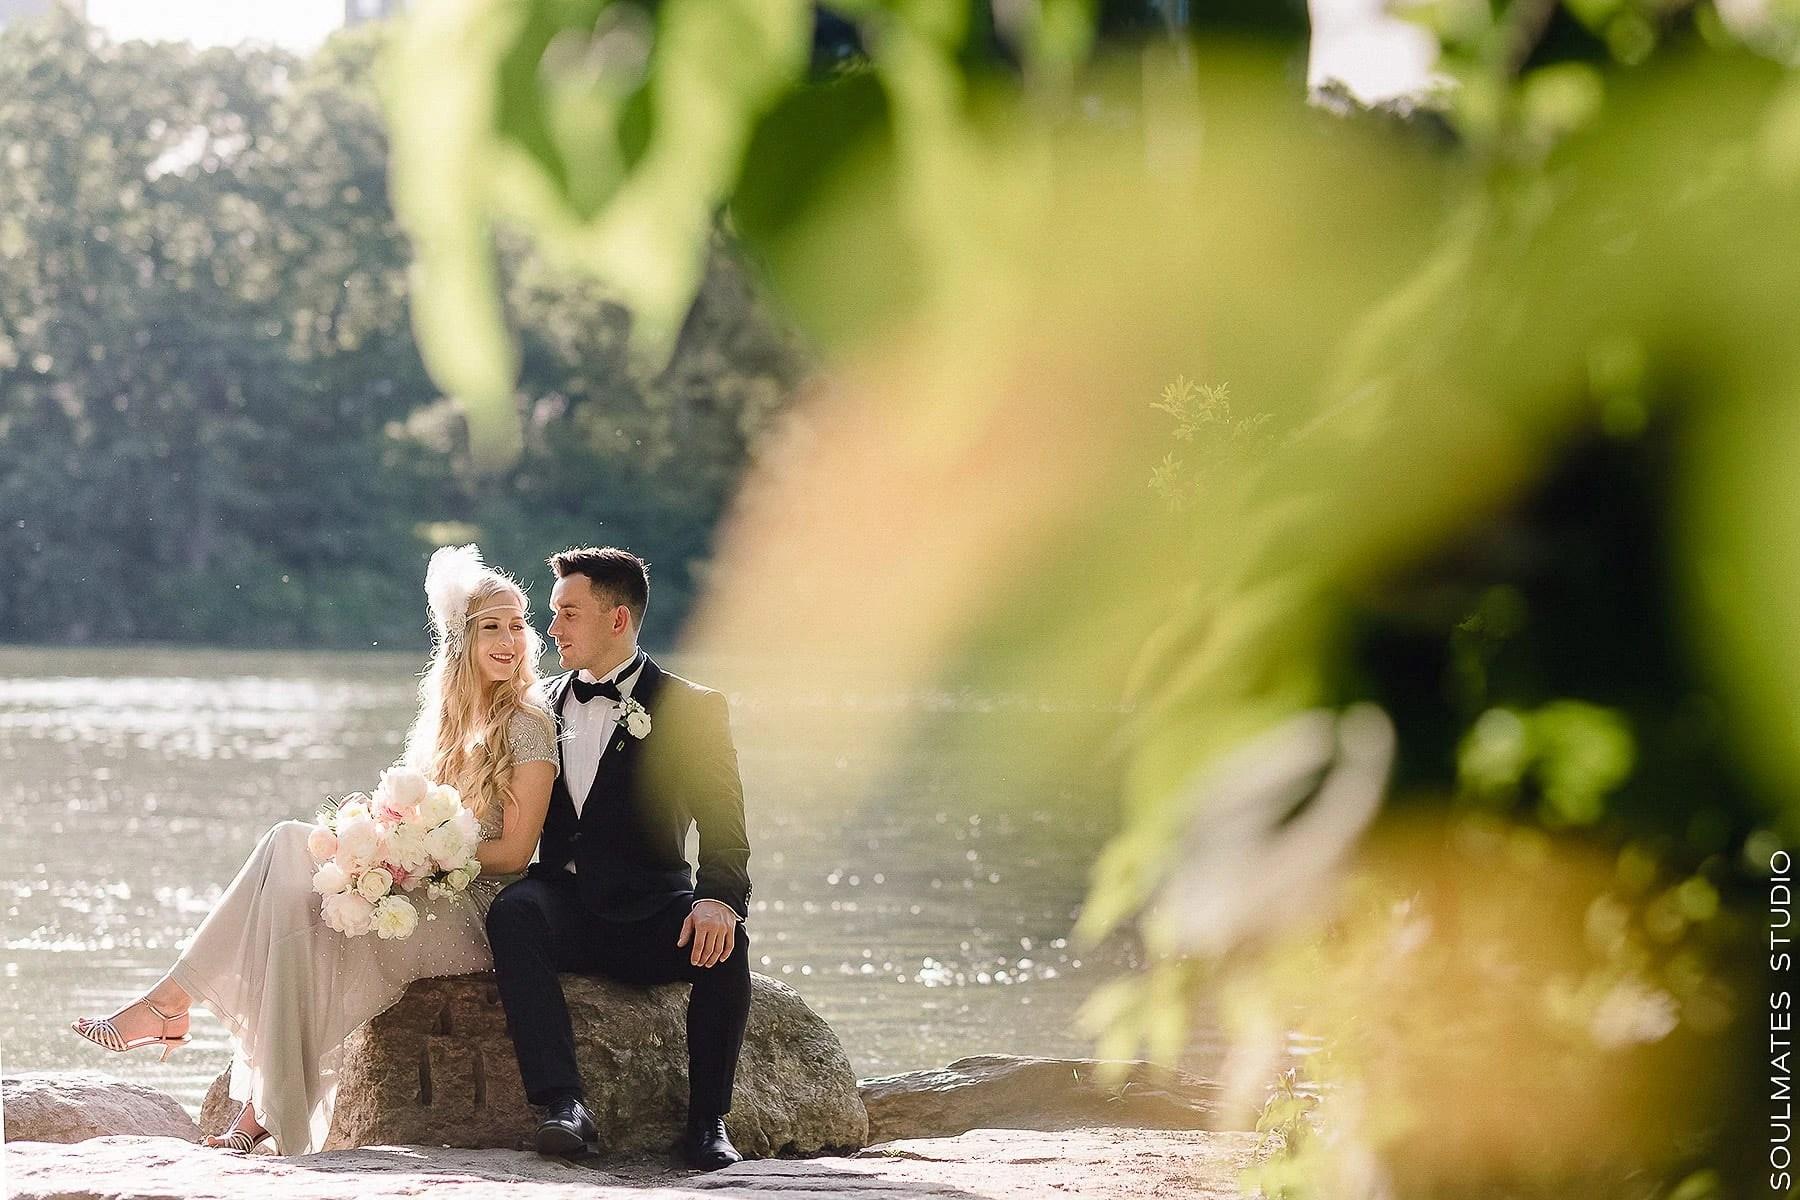 New York Central Park Elopement Wedding Bride and Groom Portrait